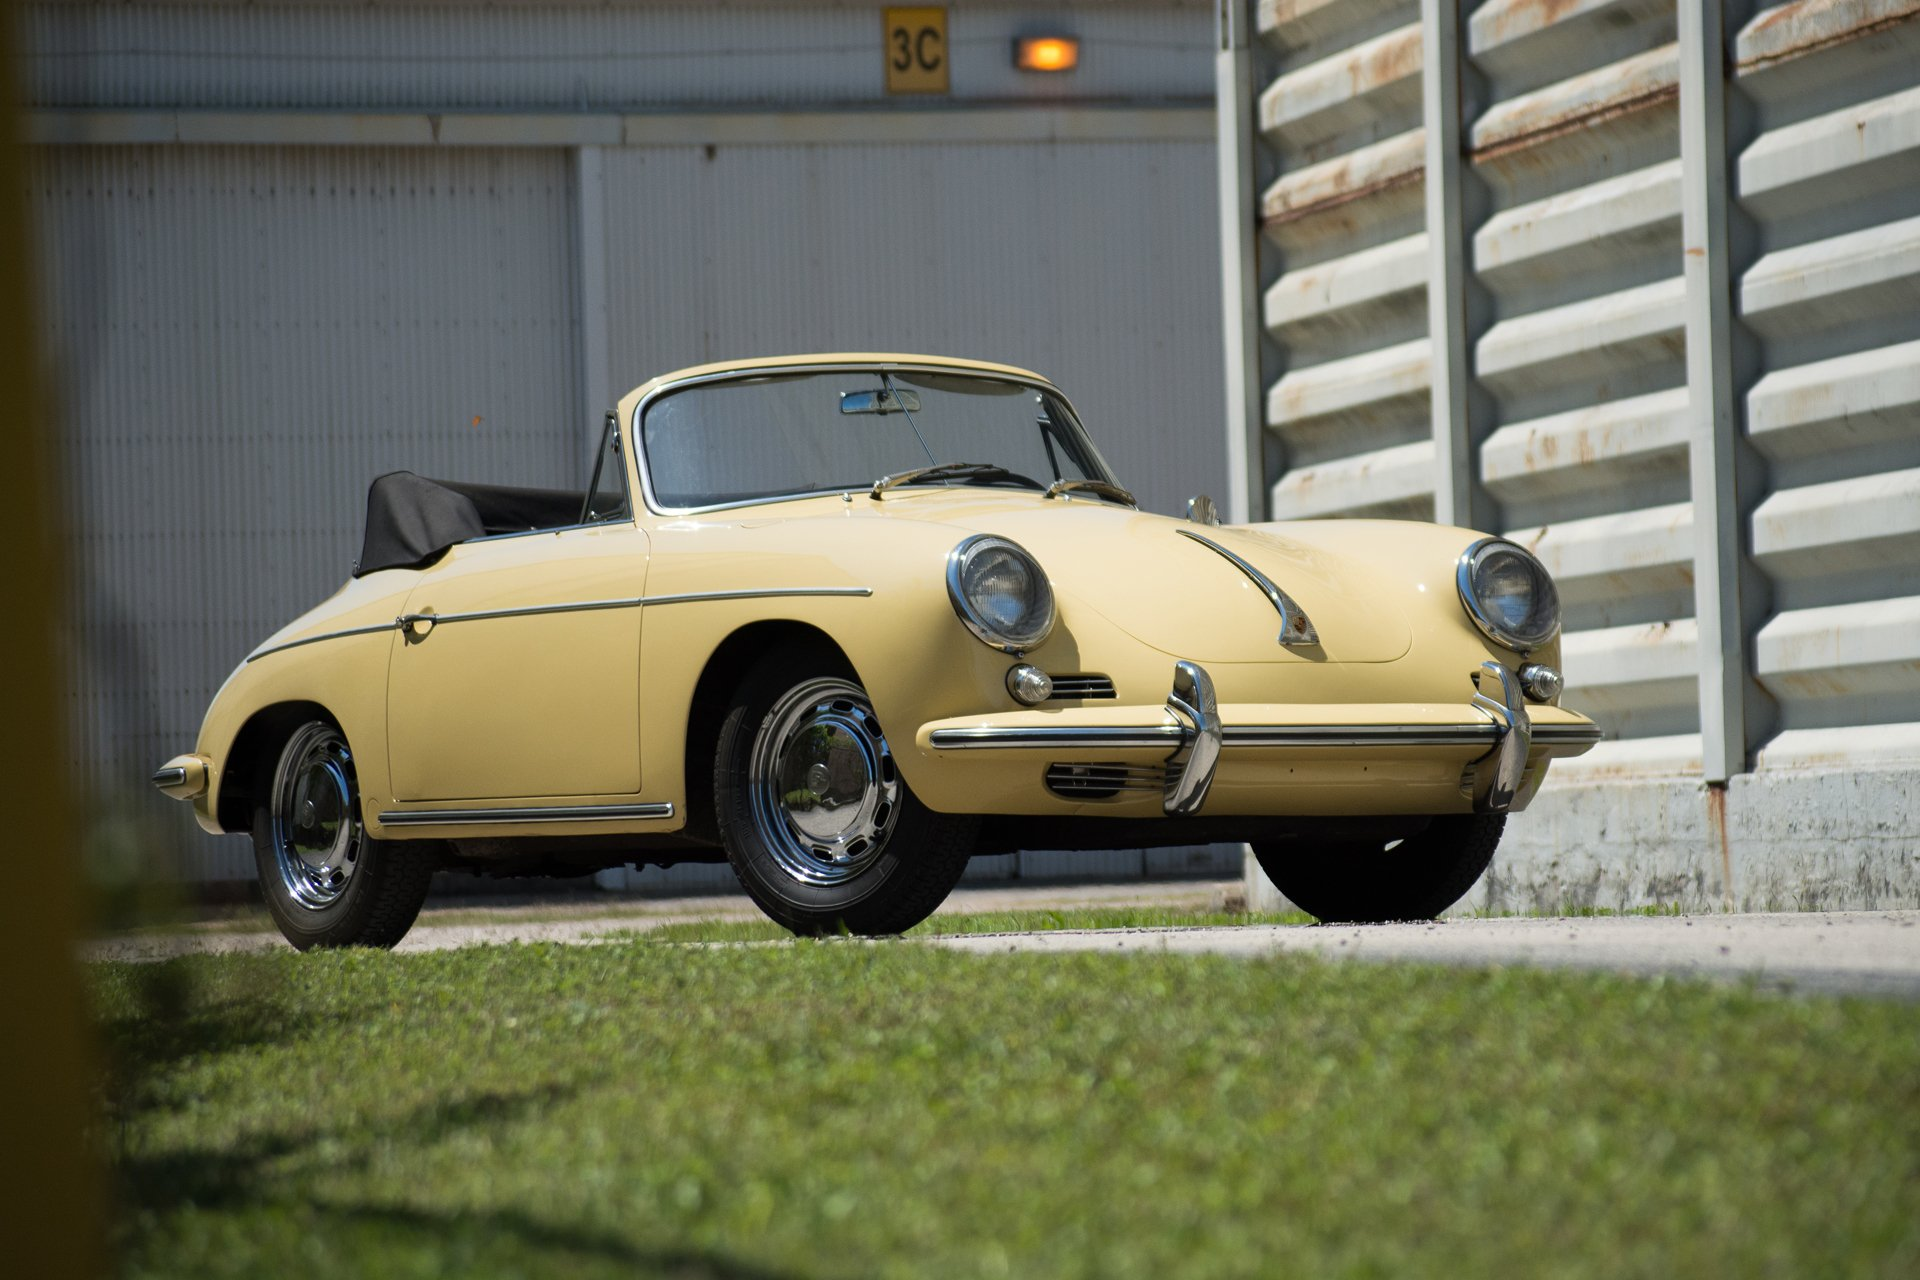 1965 porsche 356c 1600 sc cabriolet